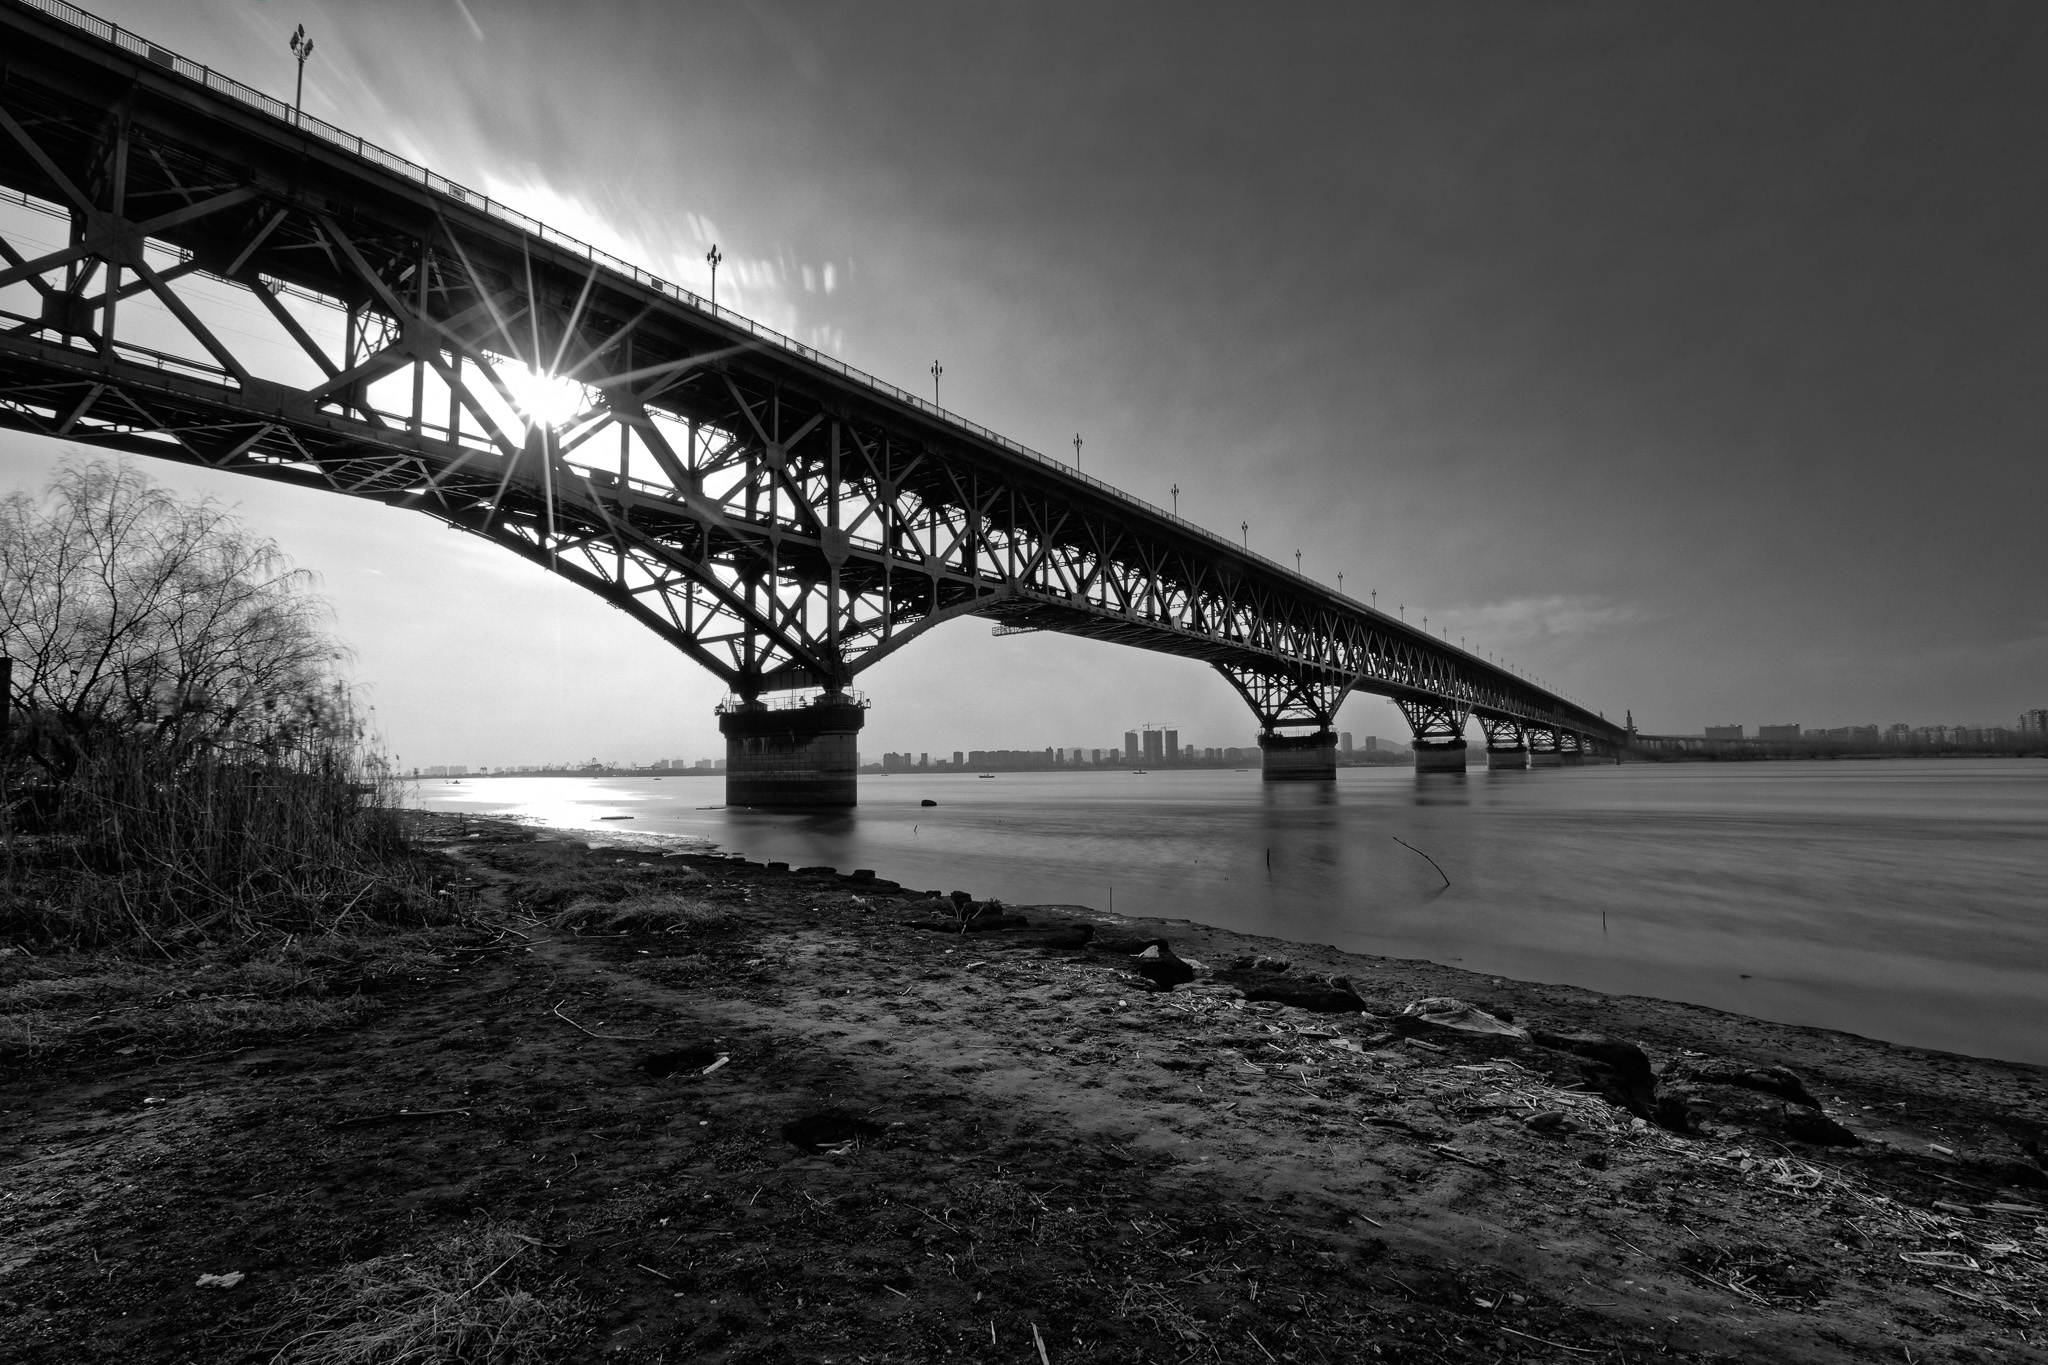 Nanjing_Yangtze_River_Bridge_Sihlouette_A.jpg